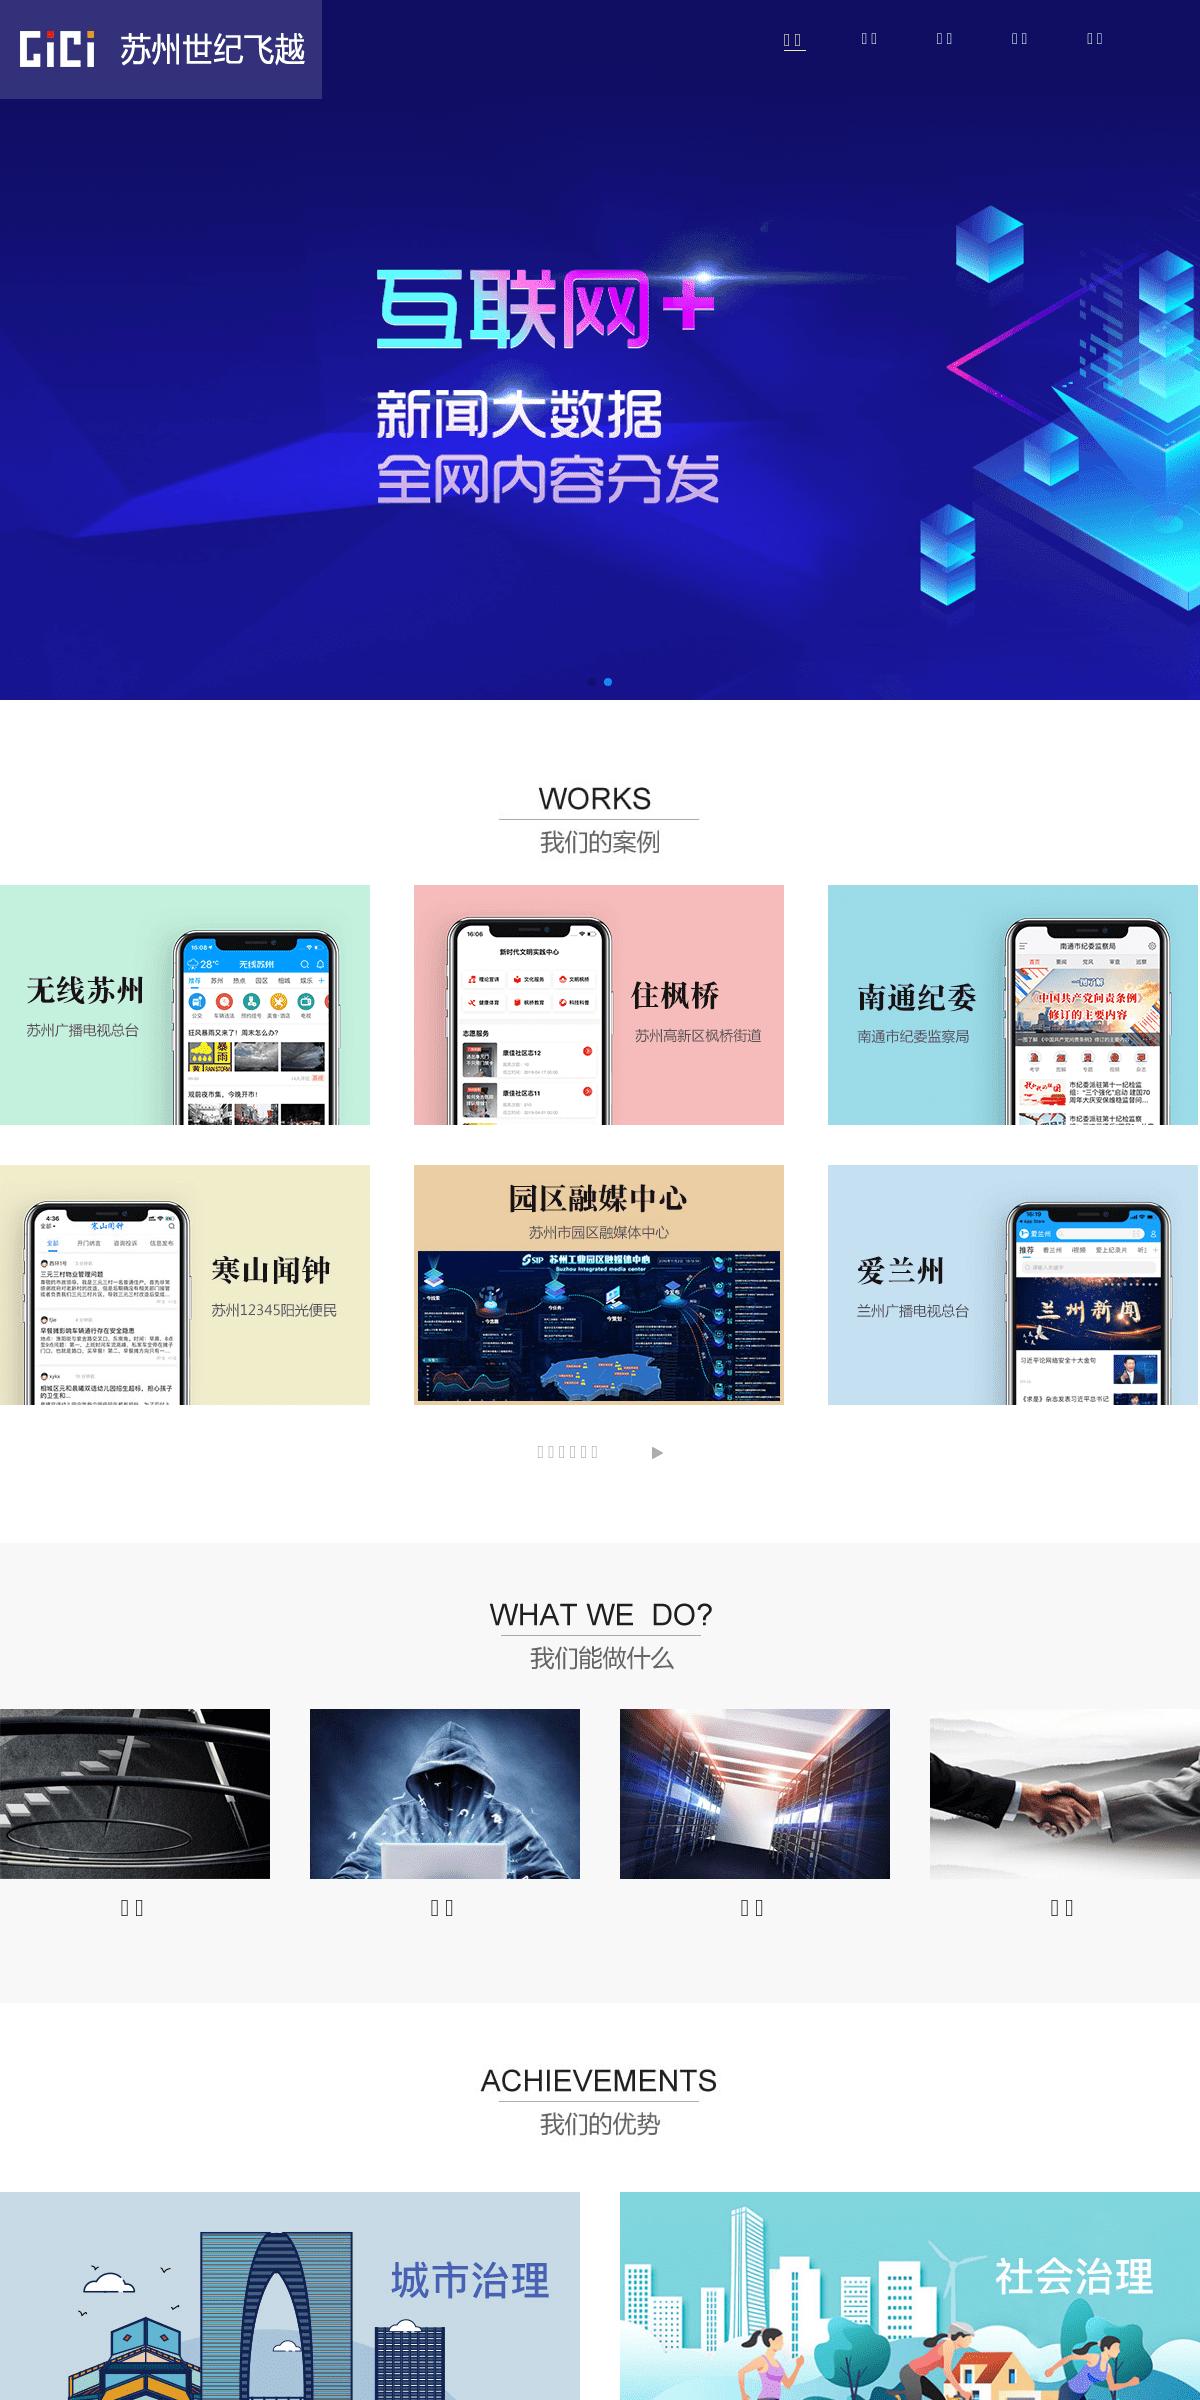 ArchiveBay.com - 2500city.com - 苏州世纪飞越网络信息有限公司